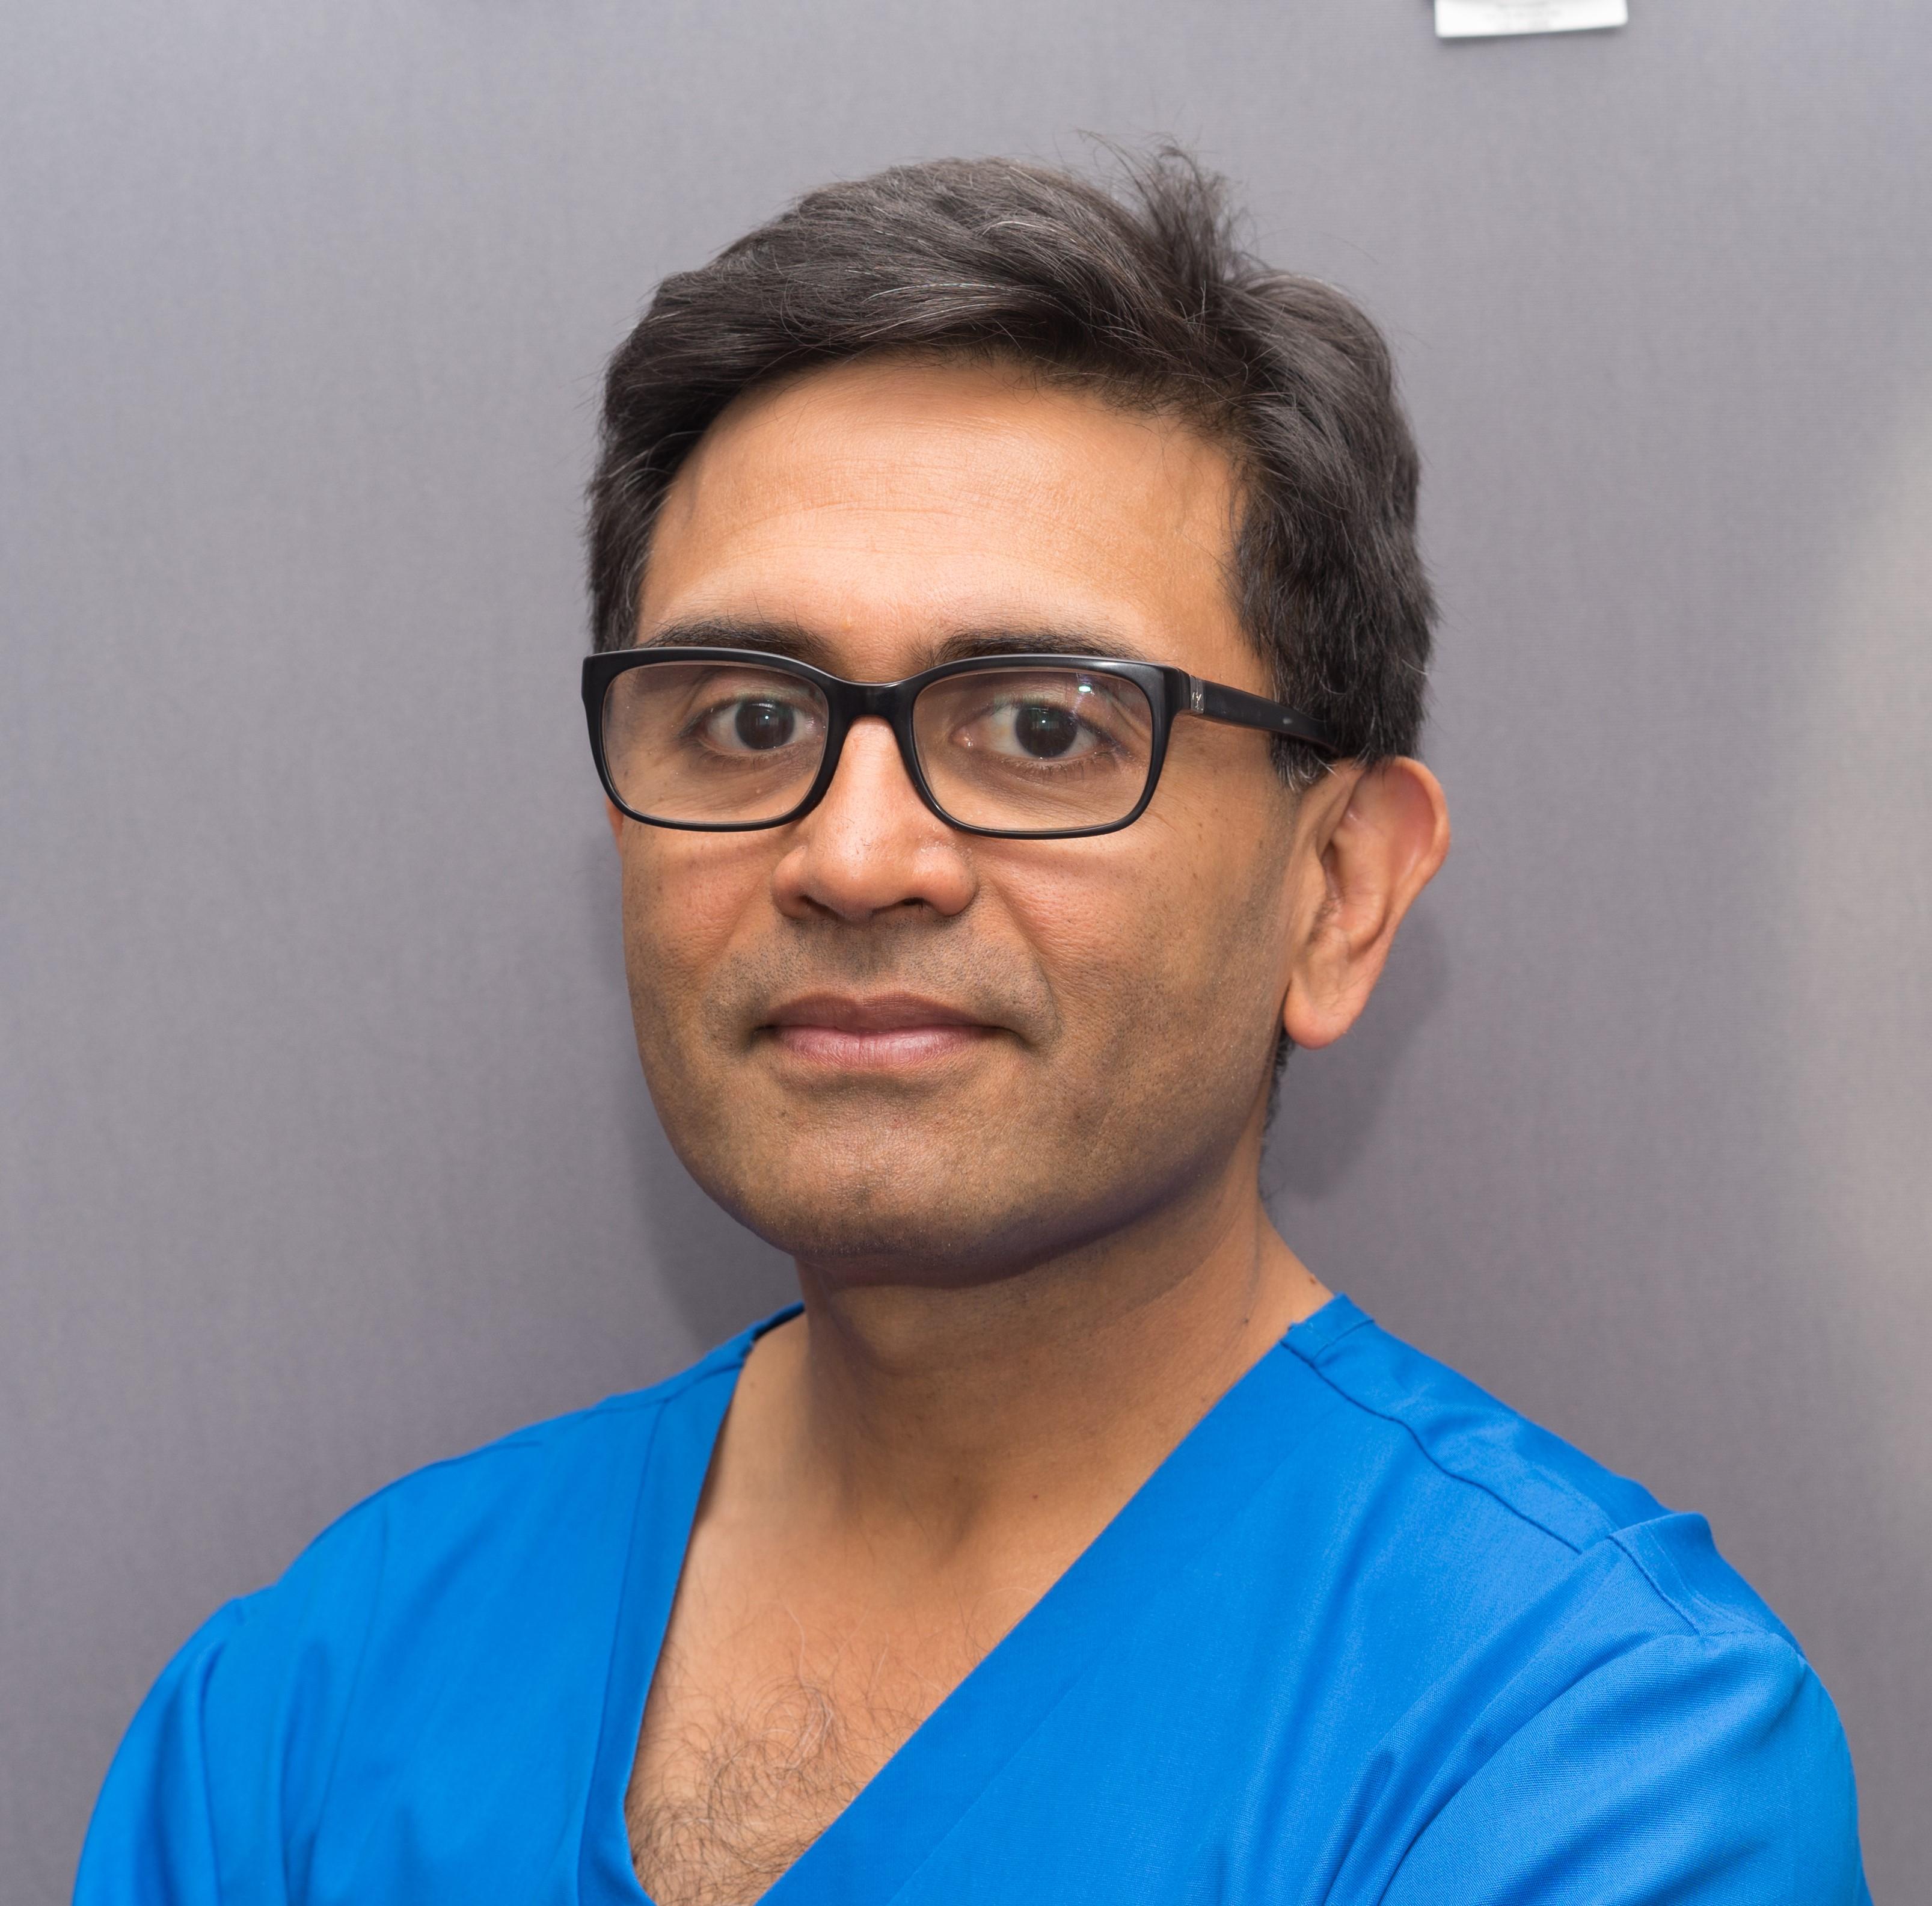 Khalid Anis facial esthetics